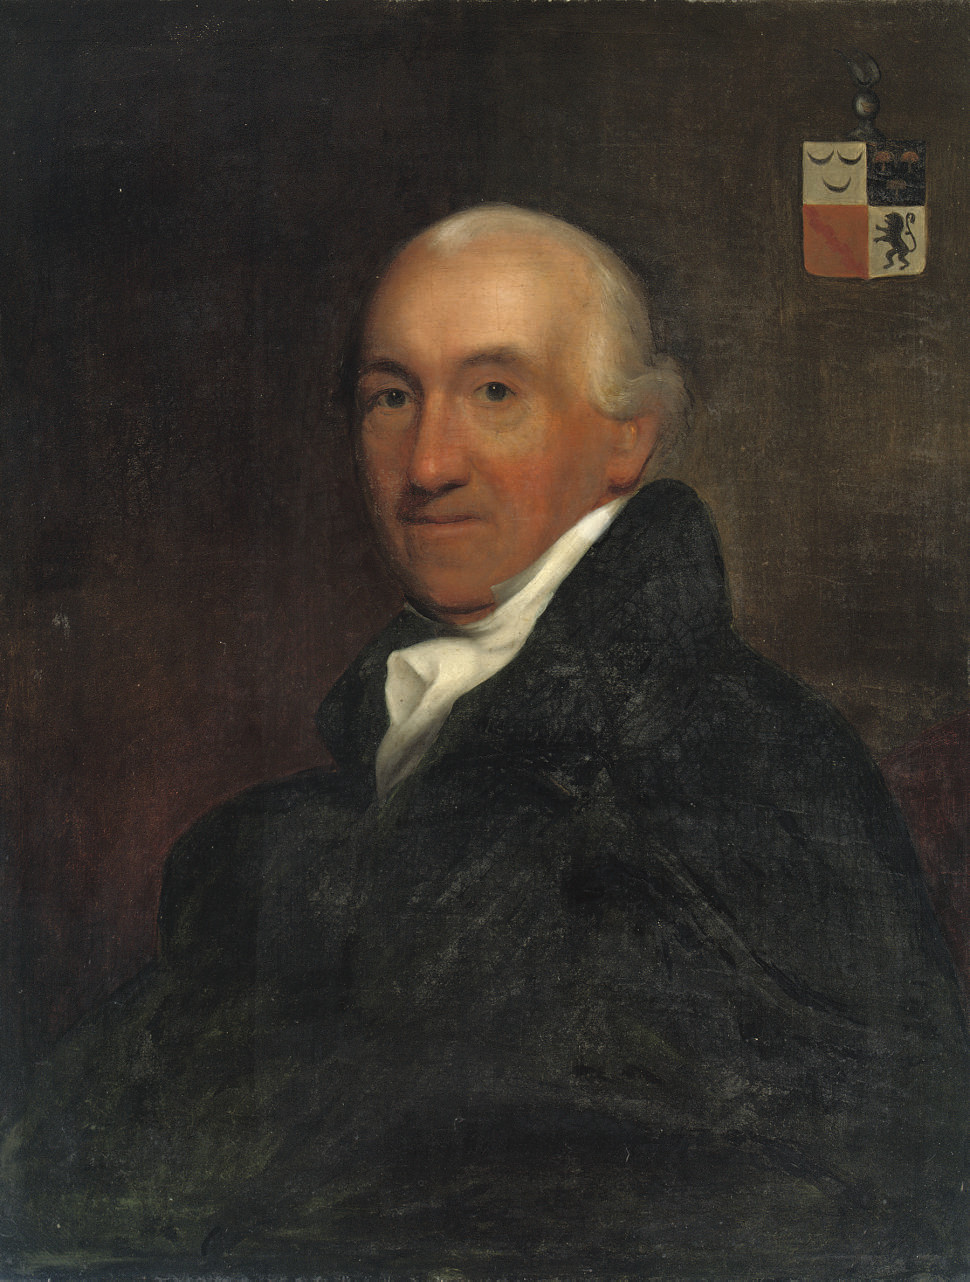 Portrait of Rogier Gerard van Polanen, half-length, in a black costume with a white jabot